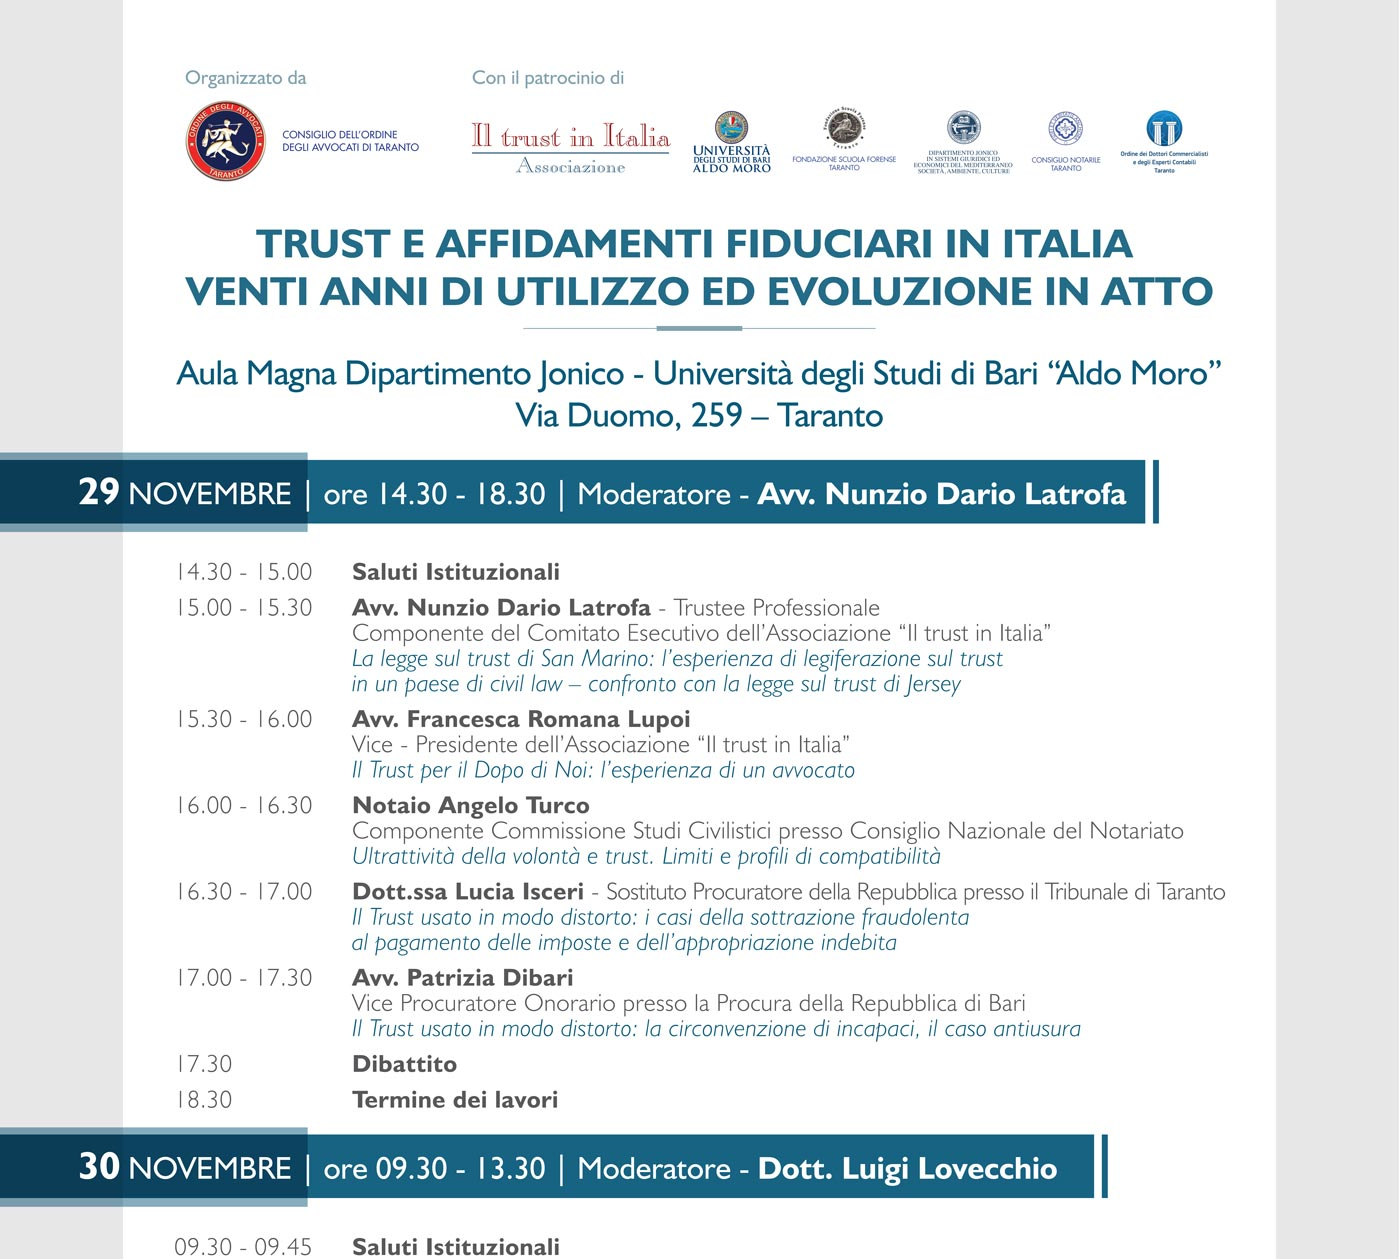 trust-affidamenti-fiduciari-italia-20anni